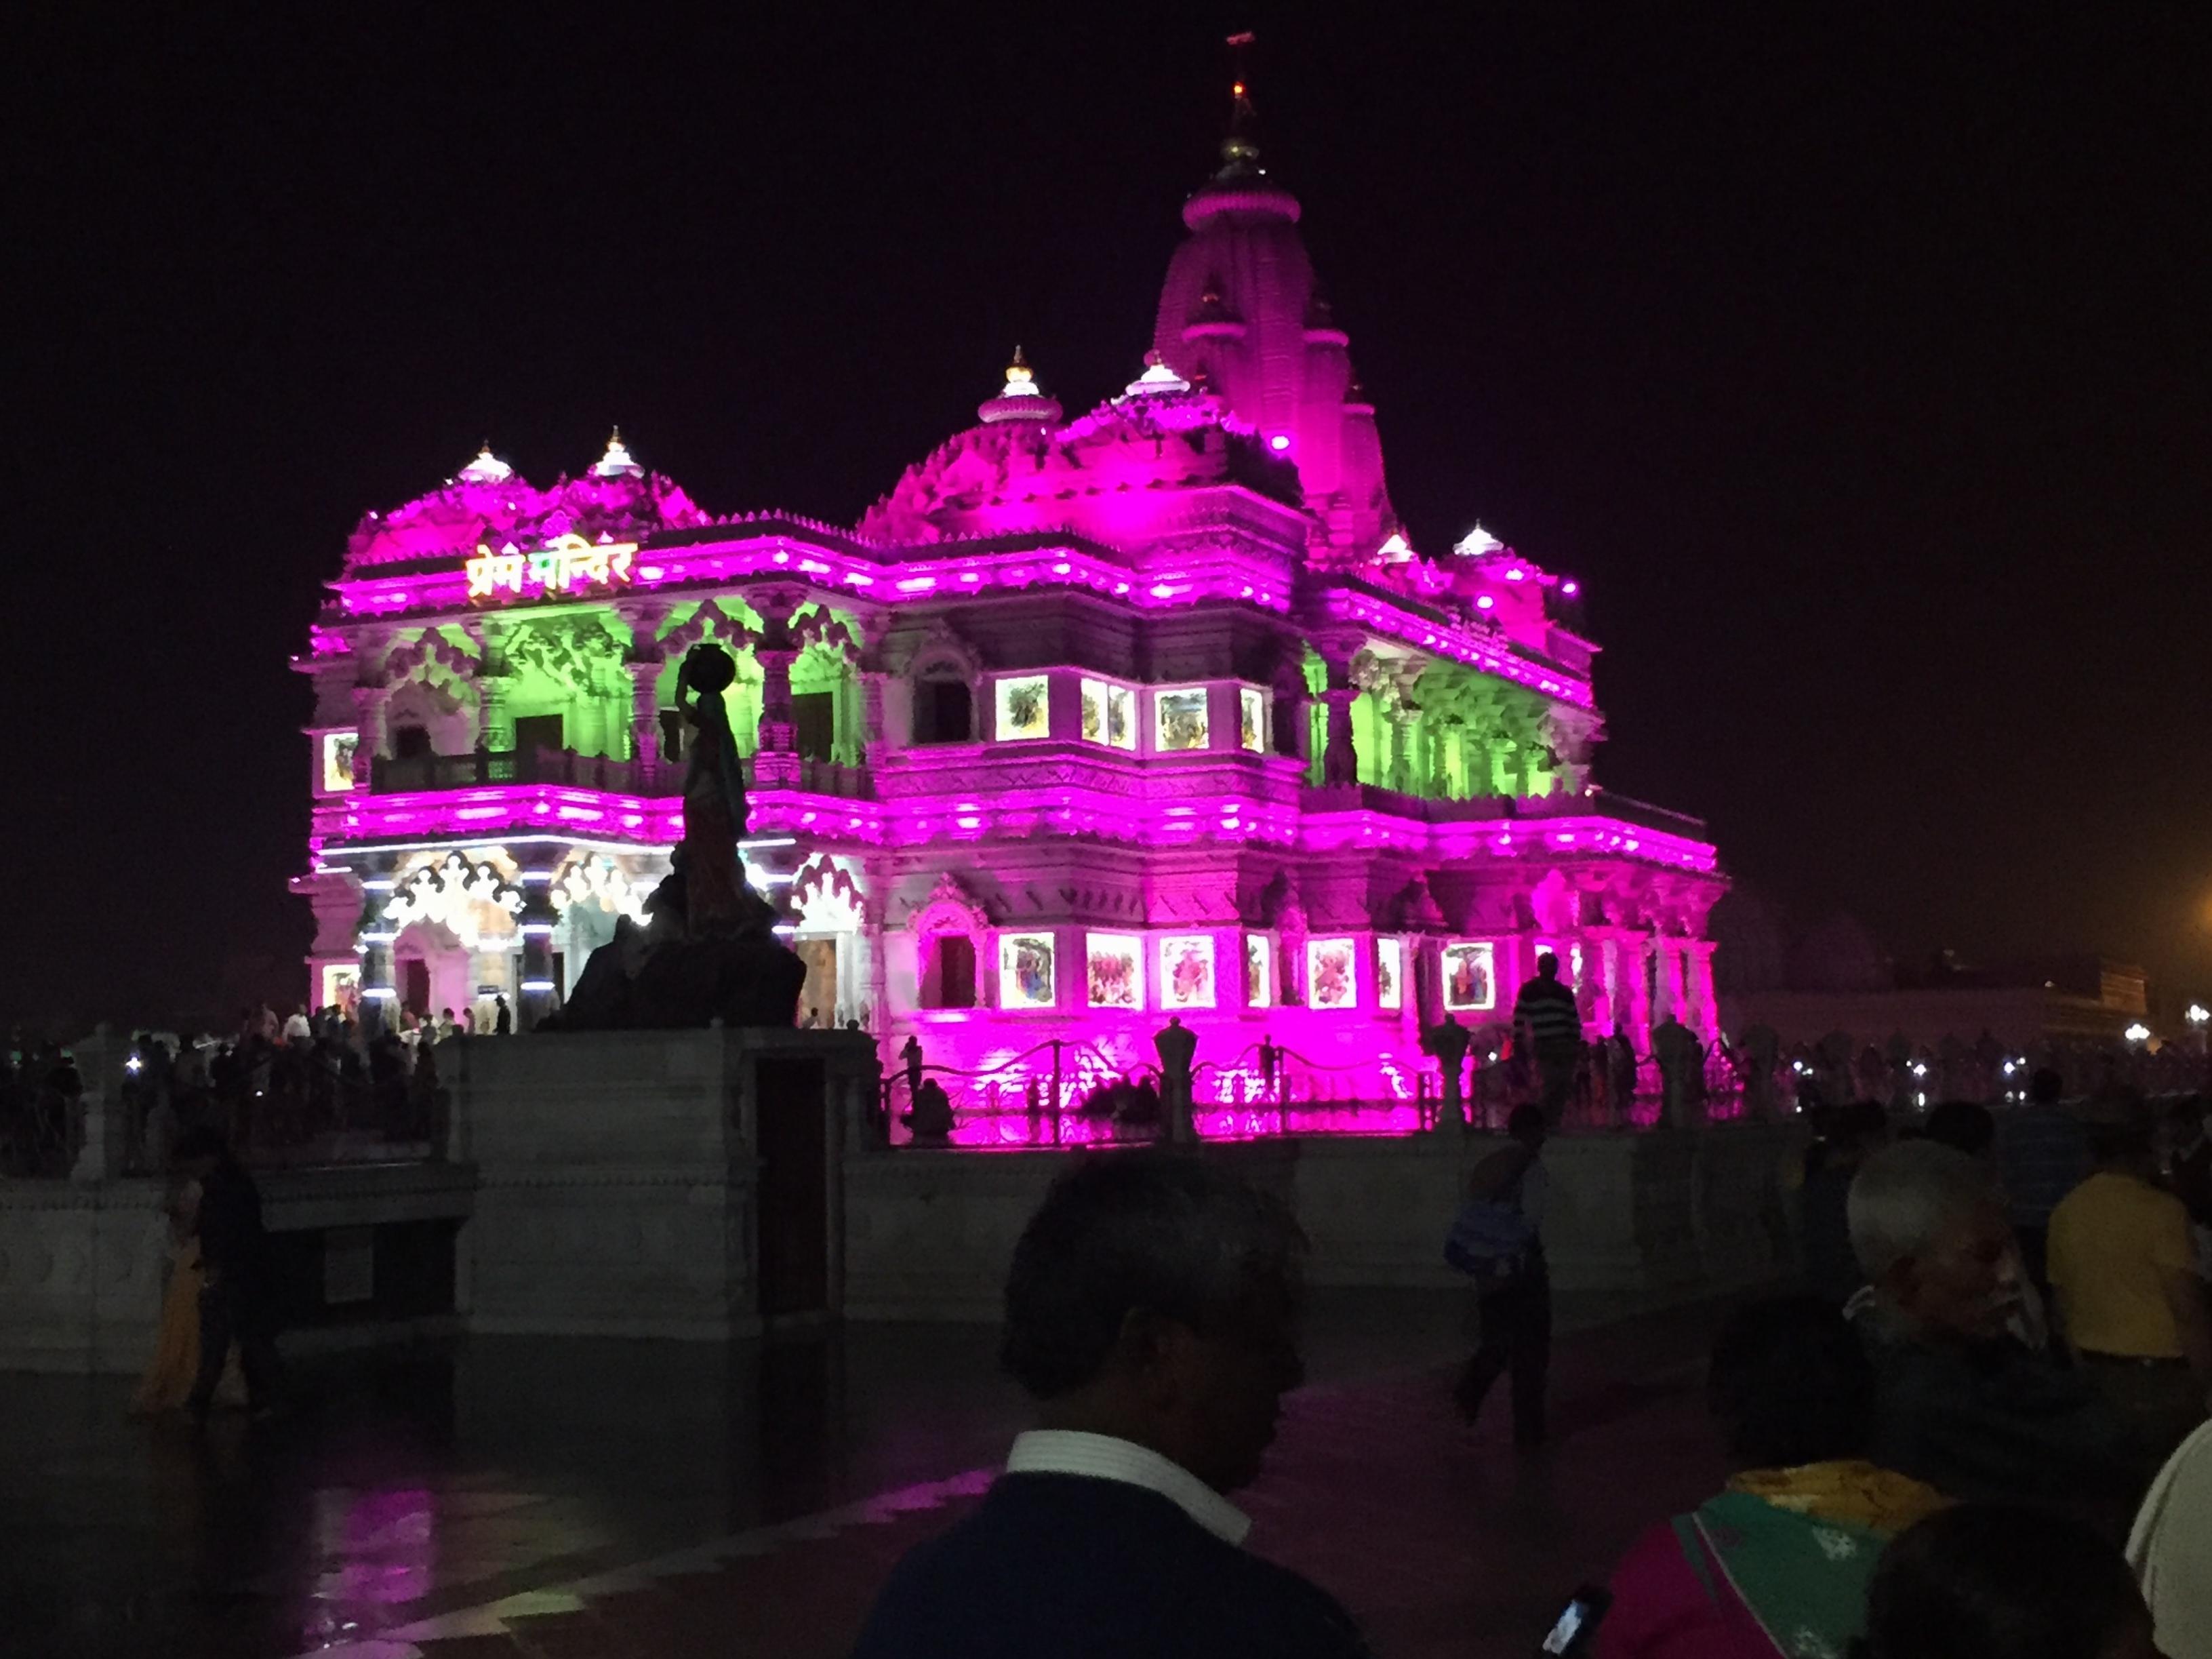 prem-mandir-tempel-in-vrindavan-2-e1458725822702